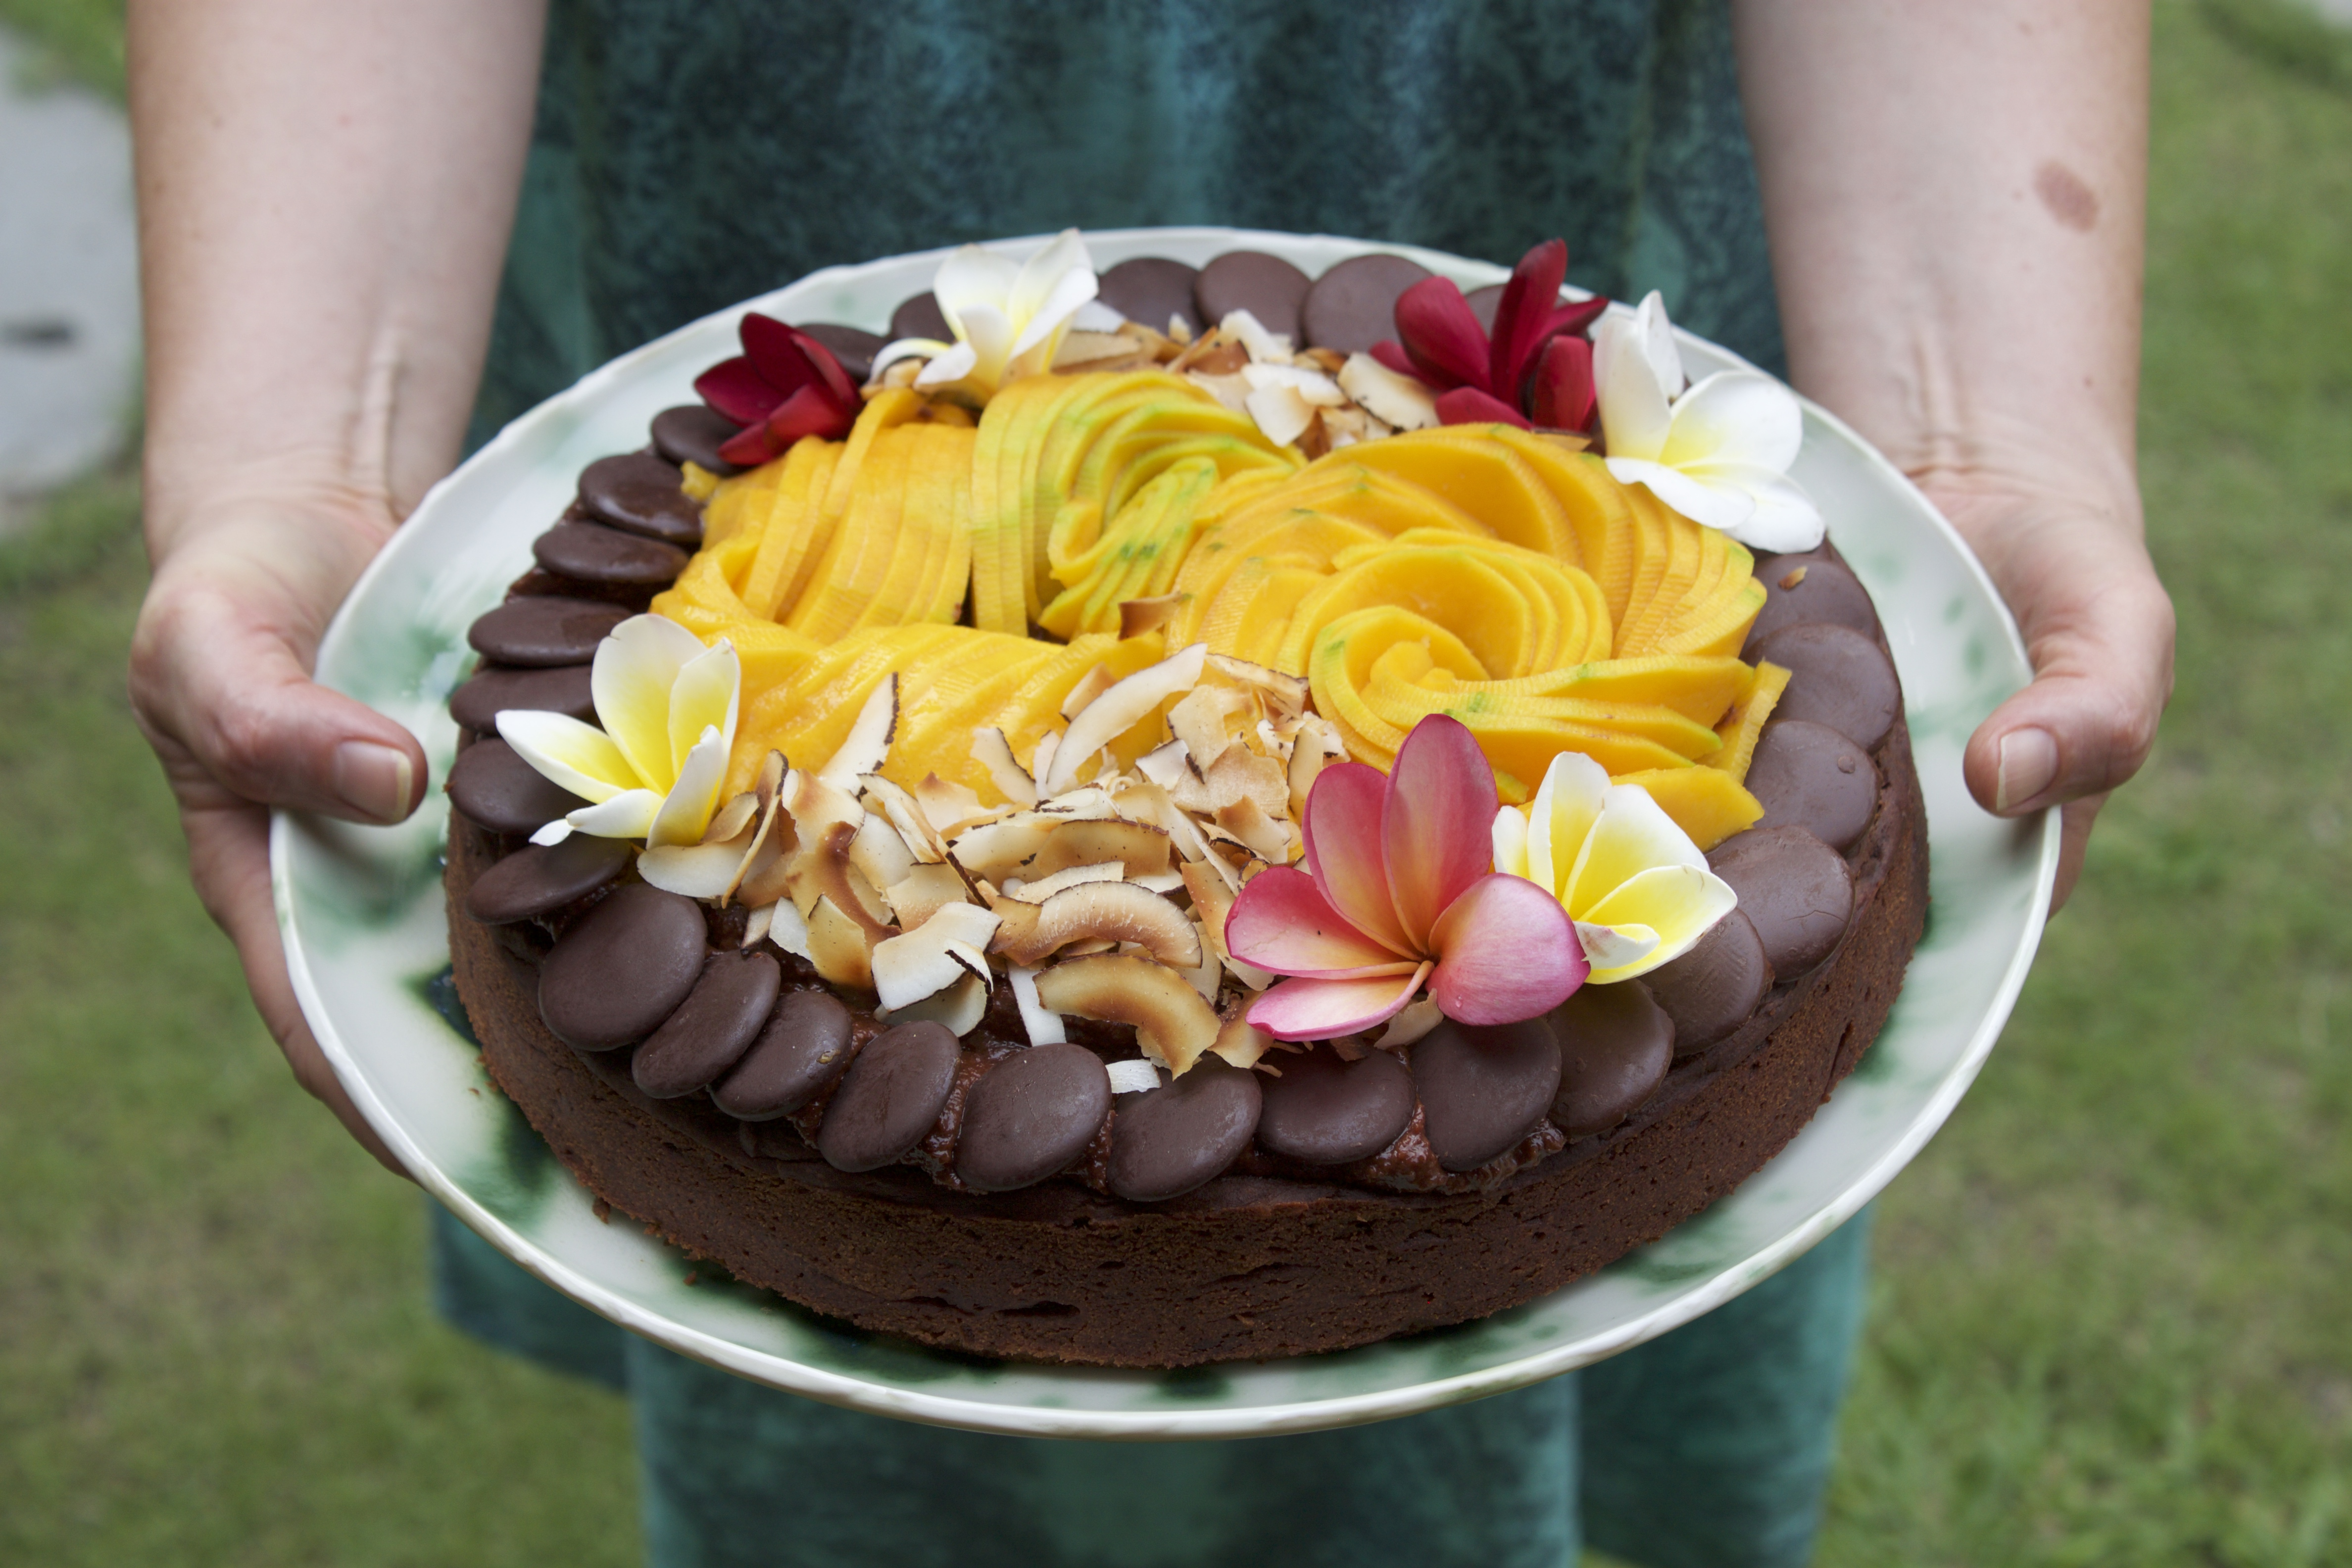 Yoga retreat chocolate cake